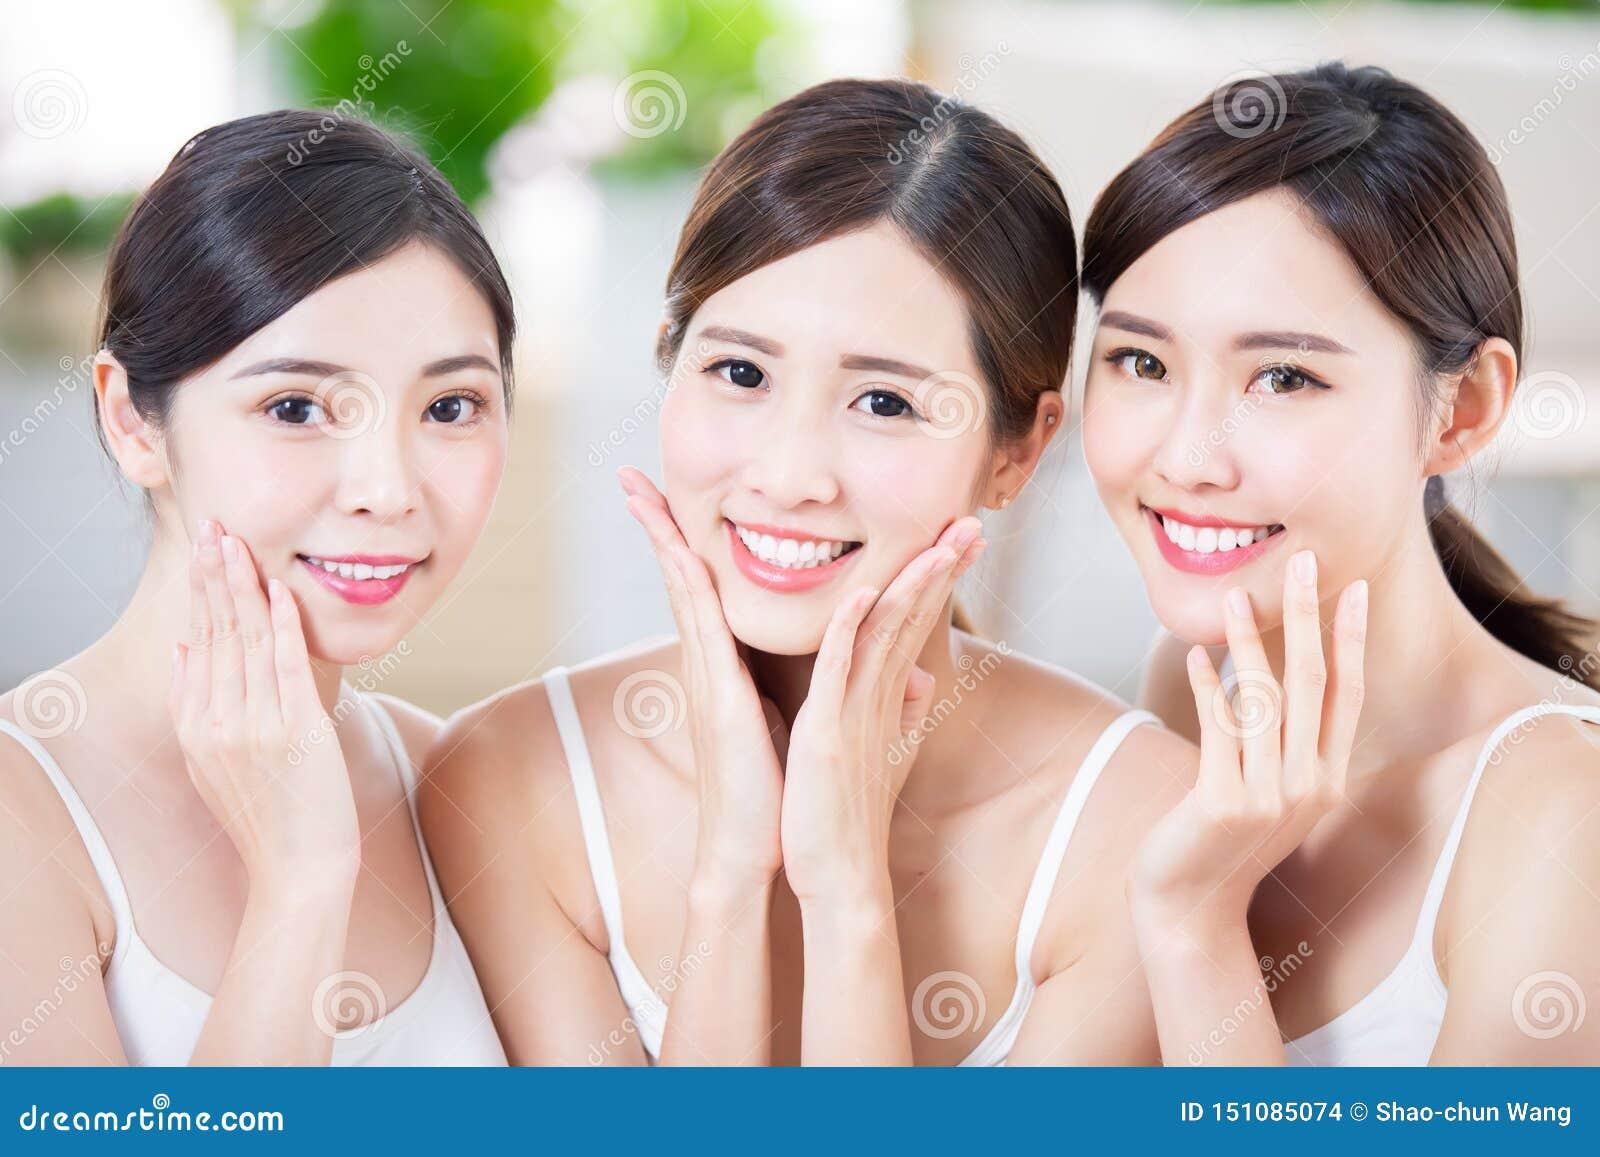 Beauty women smile happily